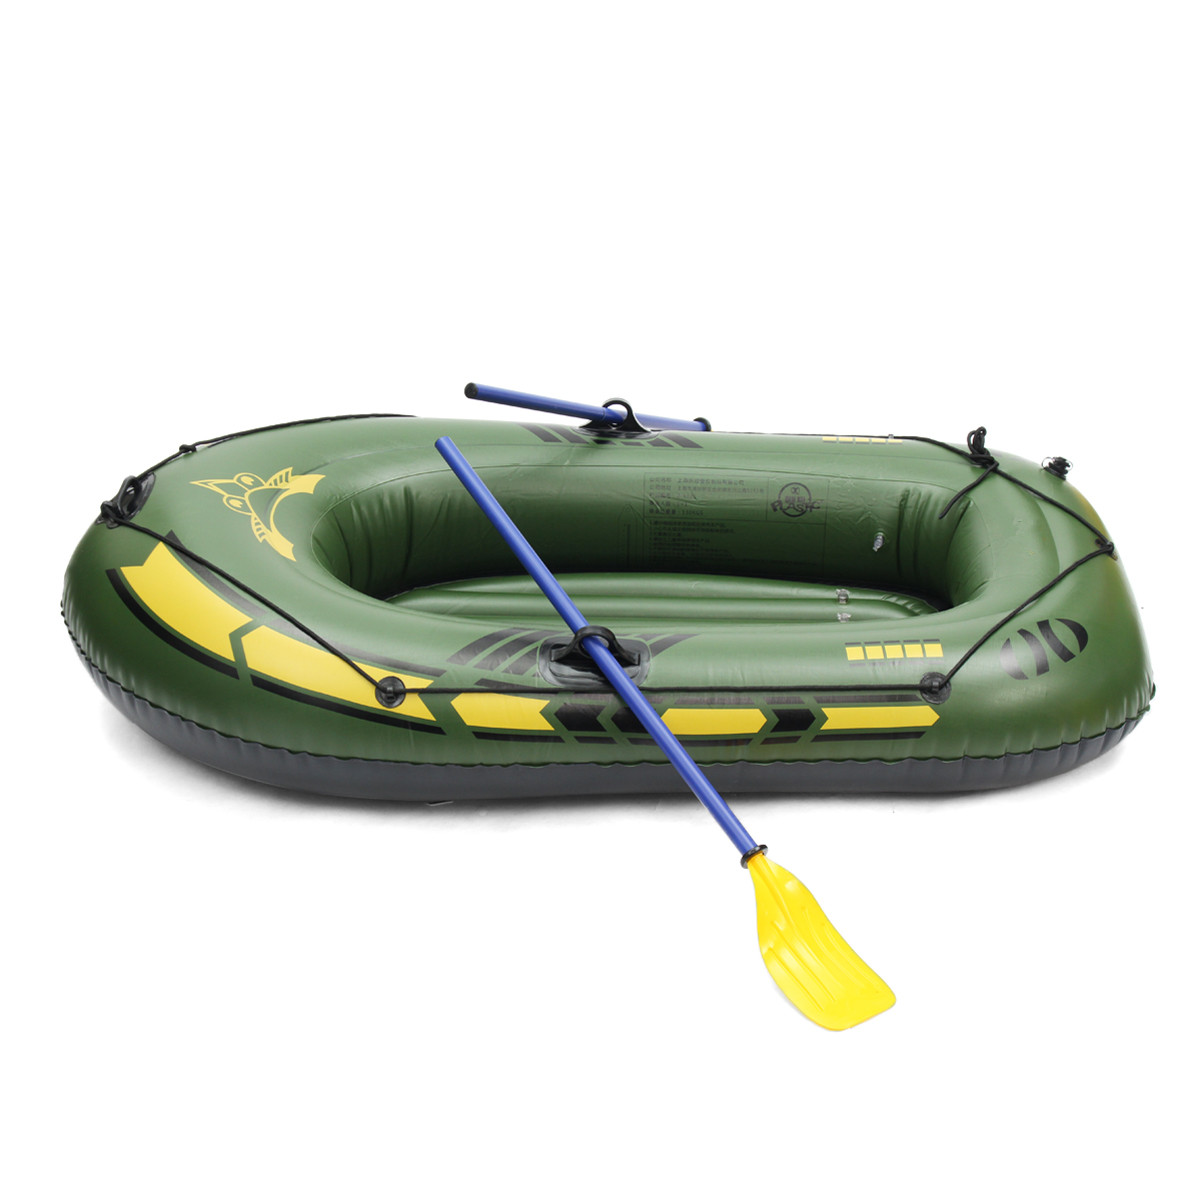 SGODDE 2 personas/3 personas engrosamiento PVC bote inflable balsa río lago bote de pesca con remos Set de carga 200kg - 5